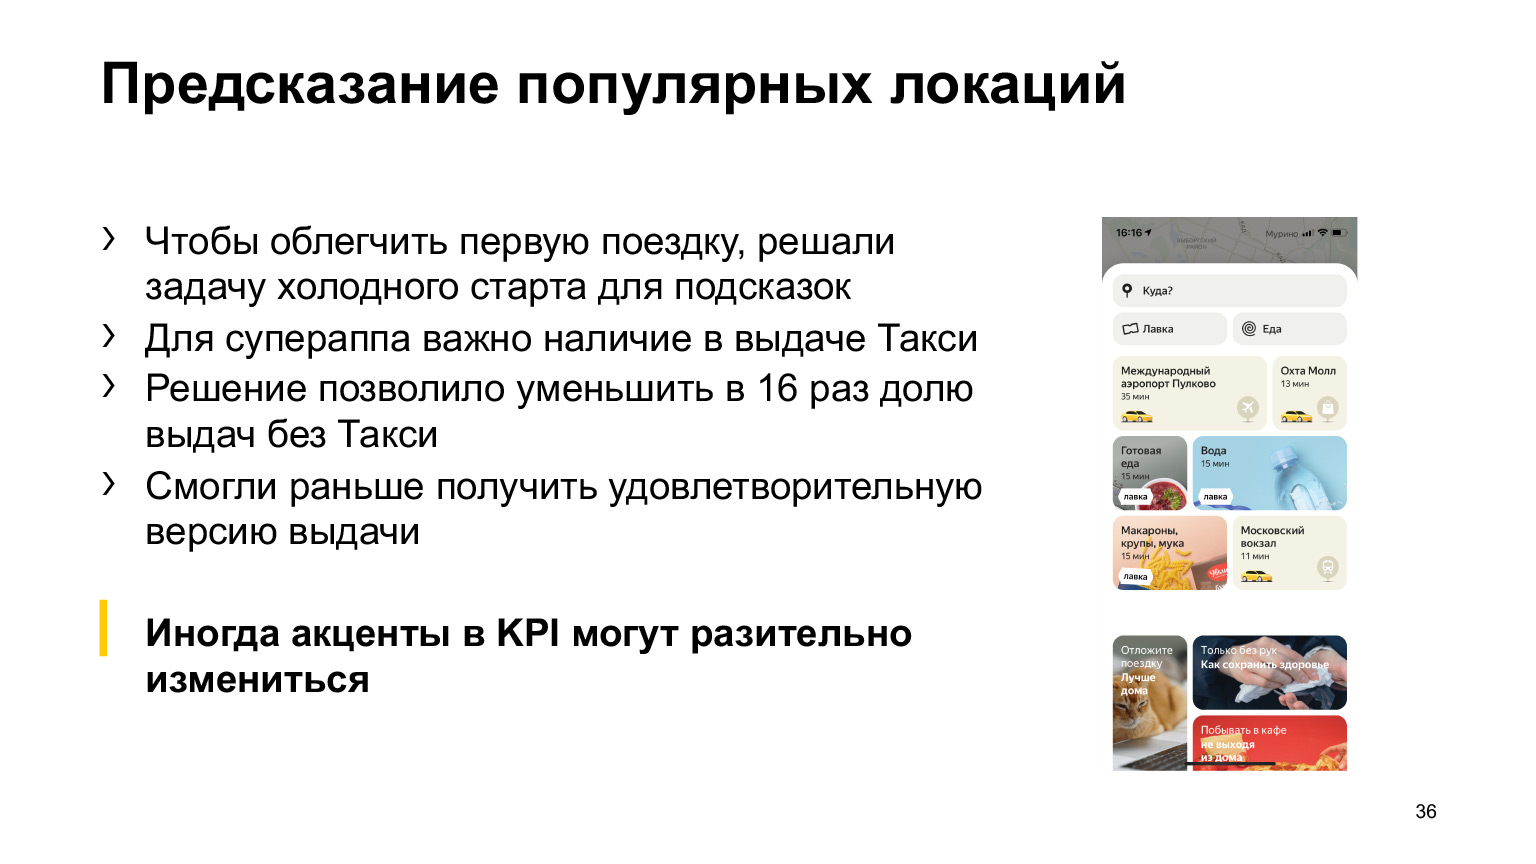 Как коронавирус повлиял на ML-проекты Такси, Еды и Лавки. Доклад Яндекса - 13